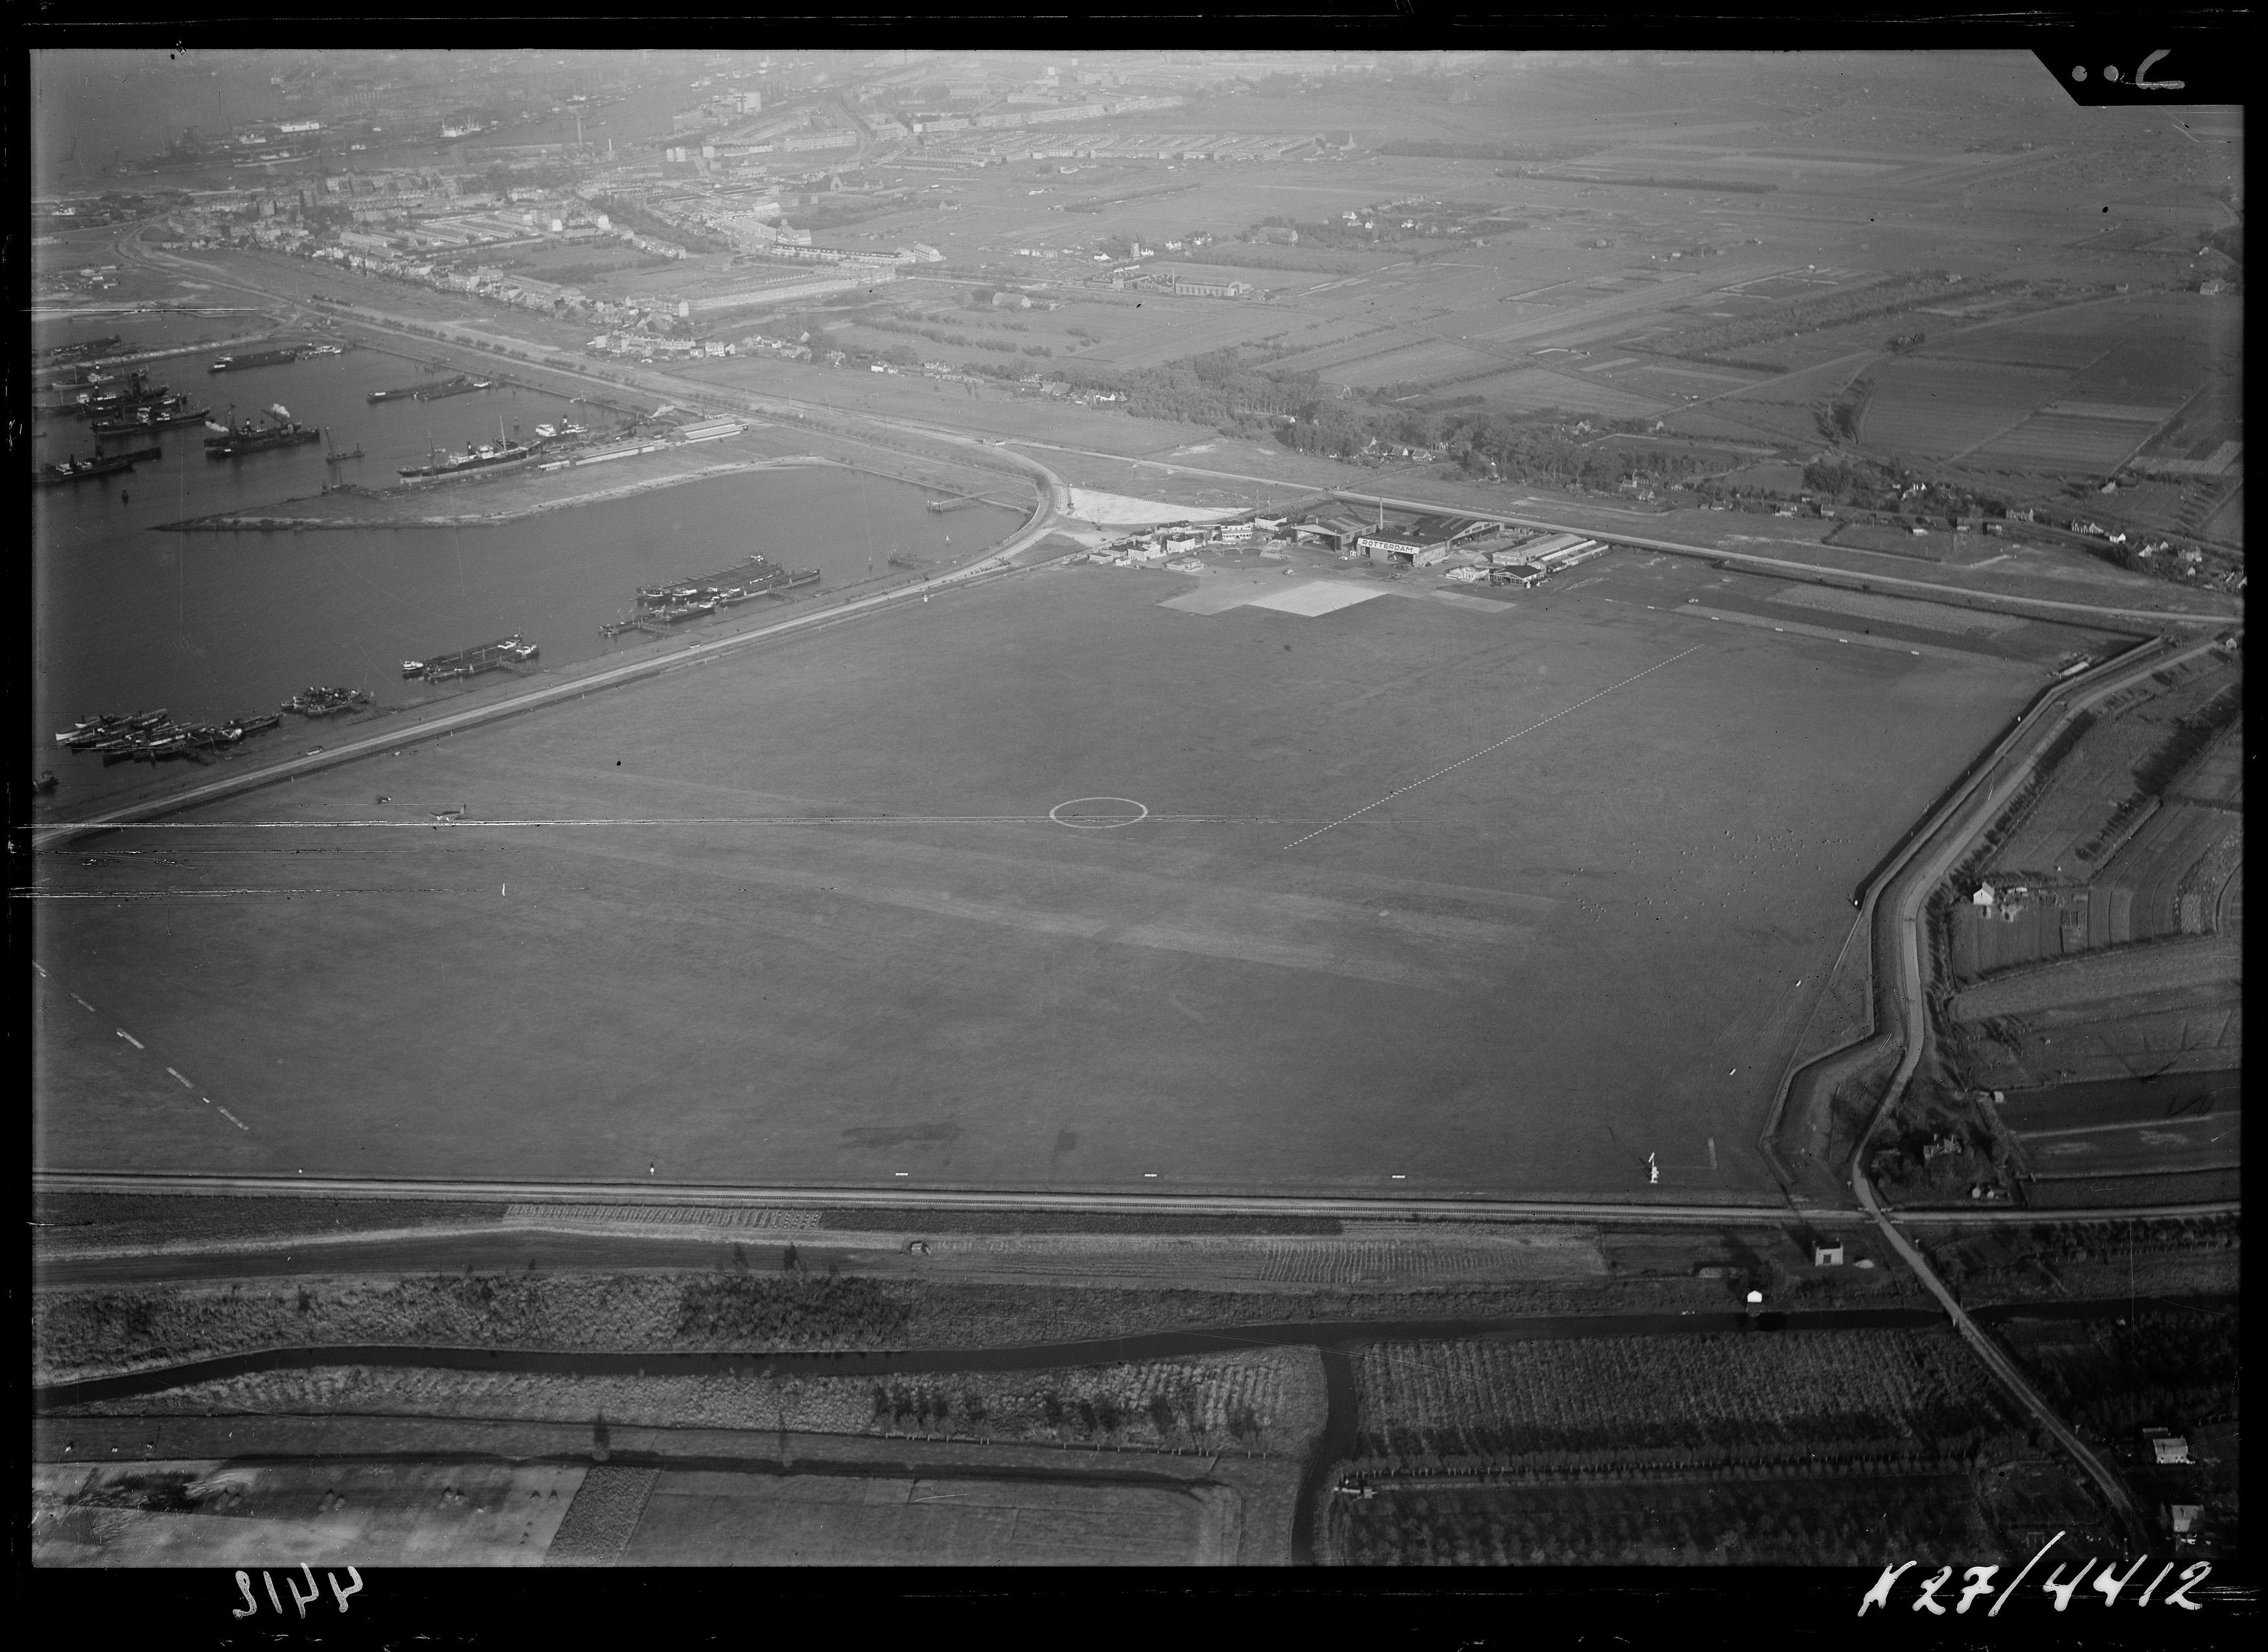 NIMH_-_2011_-_1767_-_Aerial_photograph_o